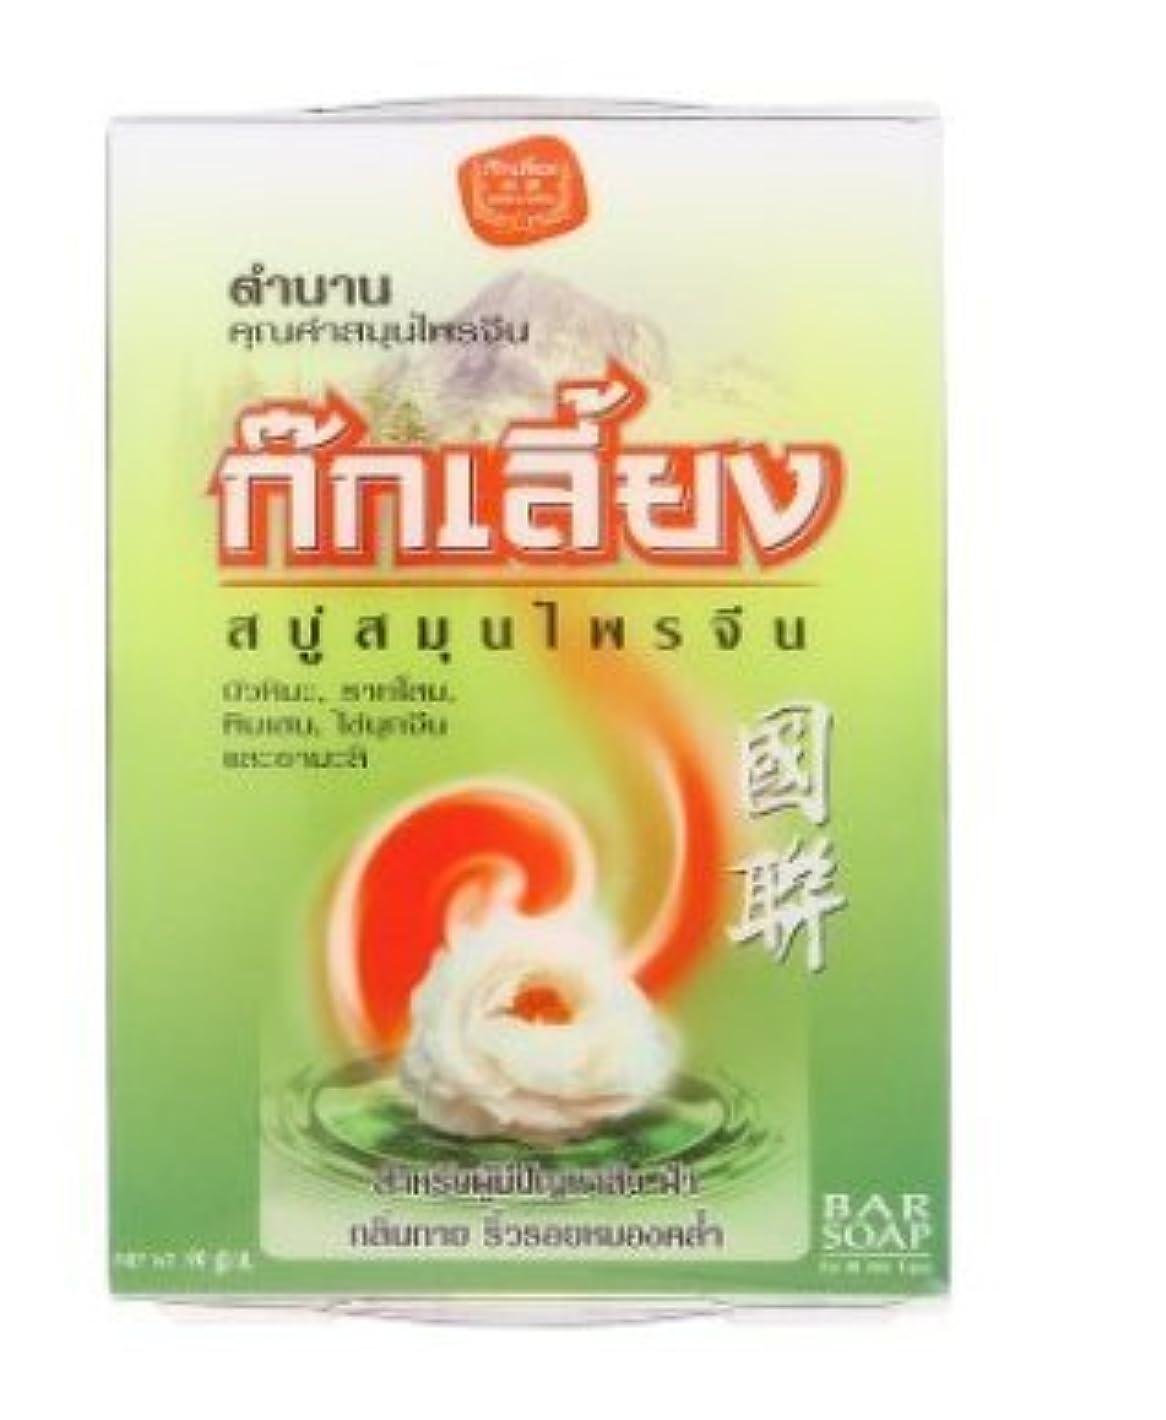 Asian Mall 中国語 ハーブソープ 顔と体のため ( 90g x 2pcs ) / Chinese Herbal Bar Soap for Face and Body Kok Liang